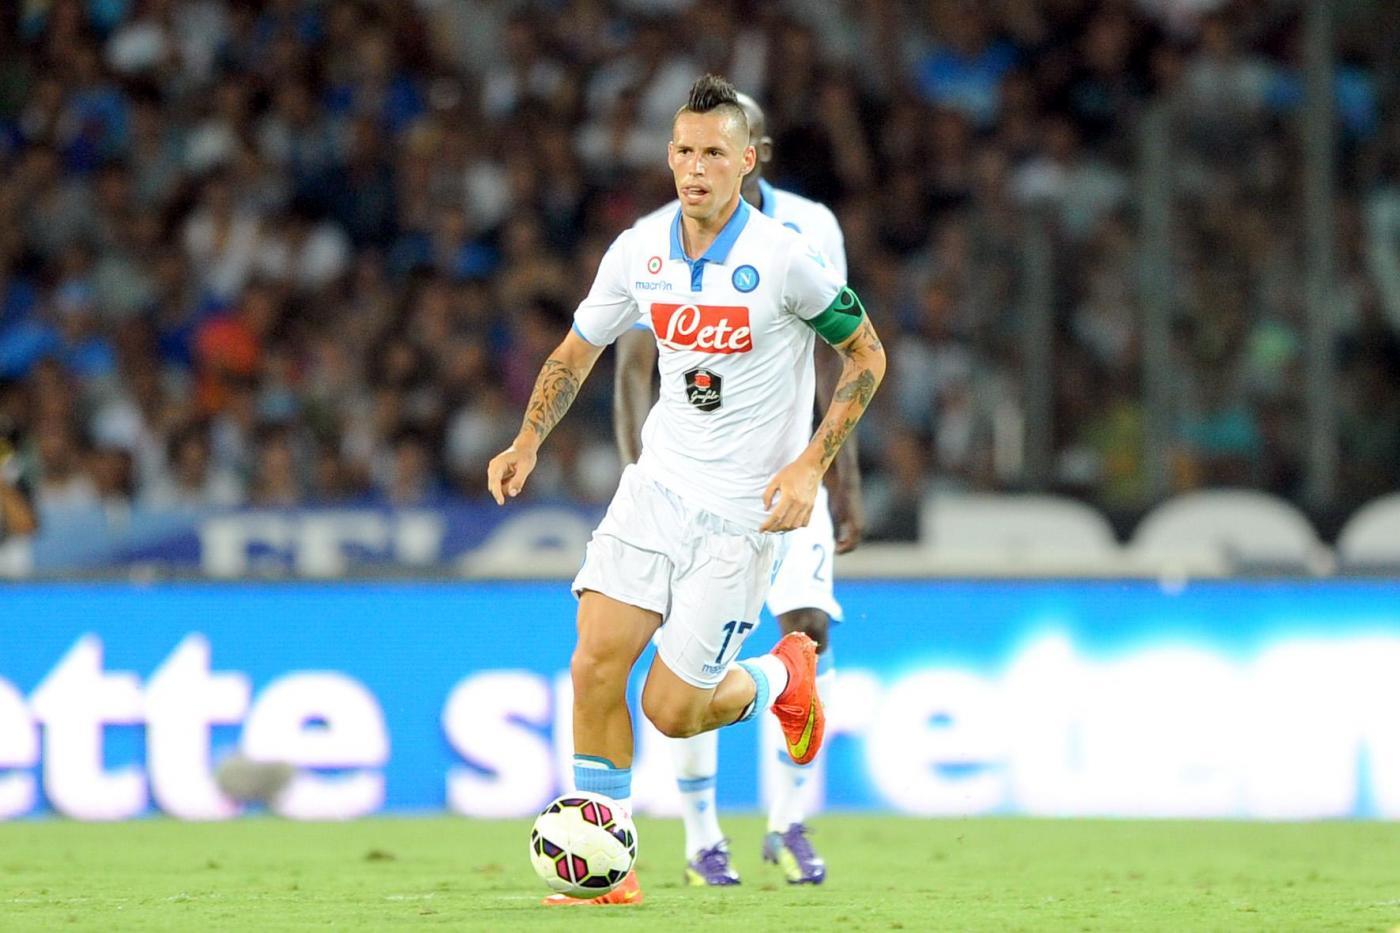 Napoli vs Atletic Bilbao Champions League